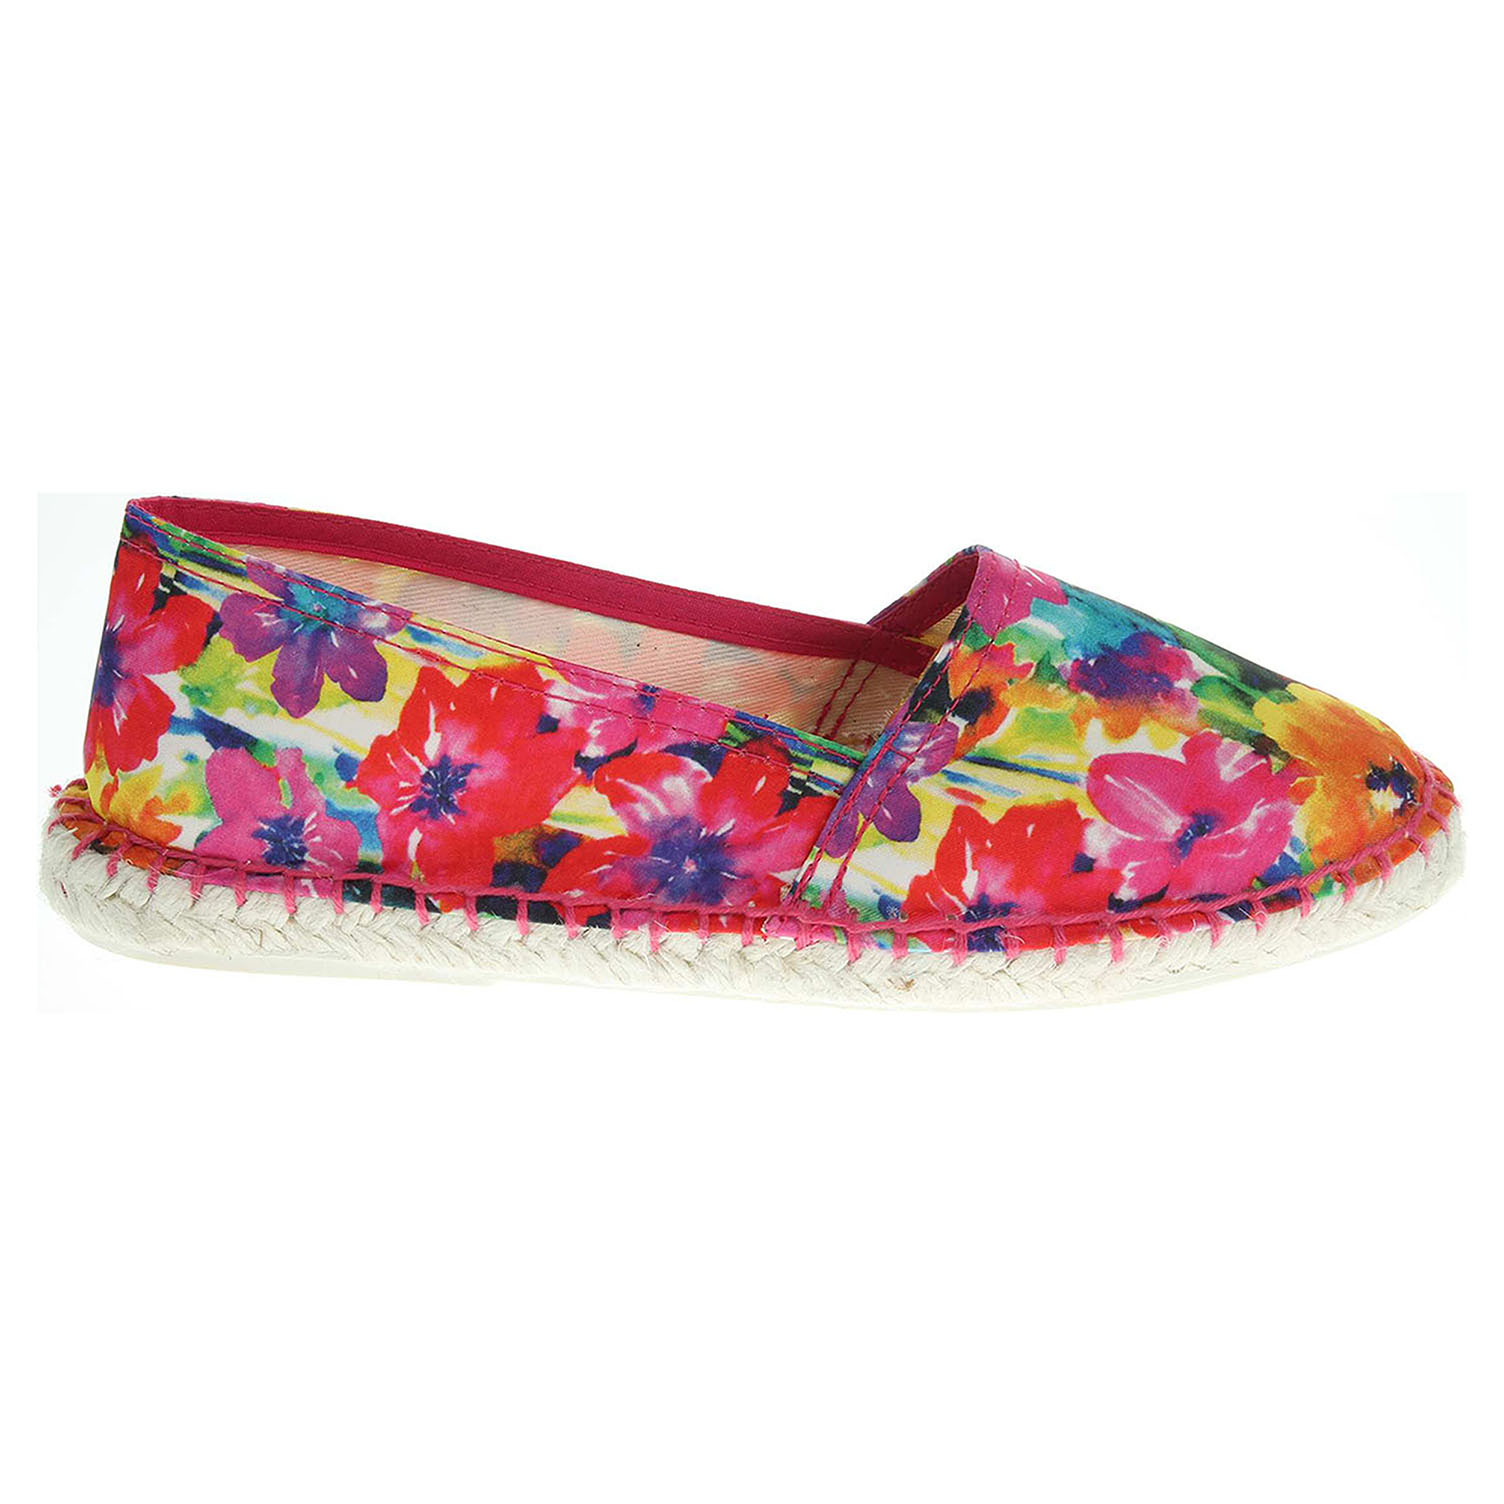 Gioseppo Archena frambuesa dámská obuv textilní Archena frambuesa 37